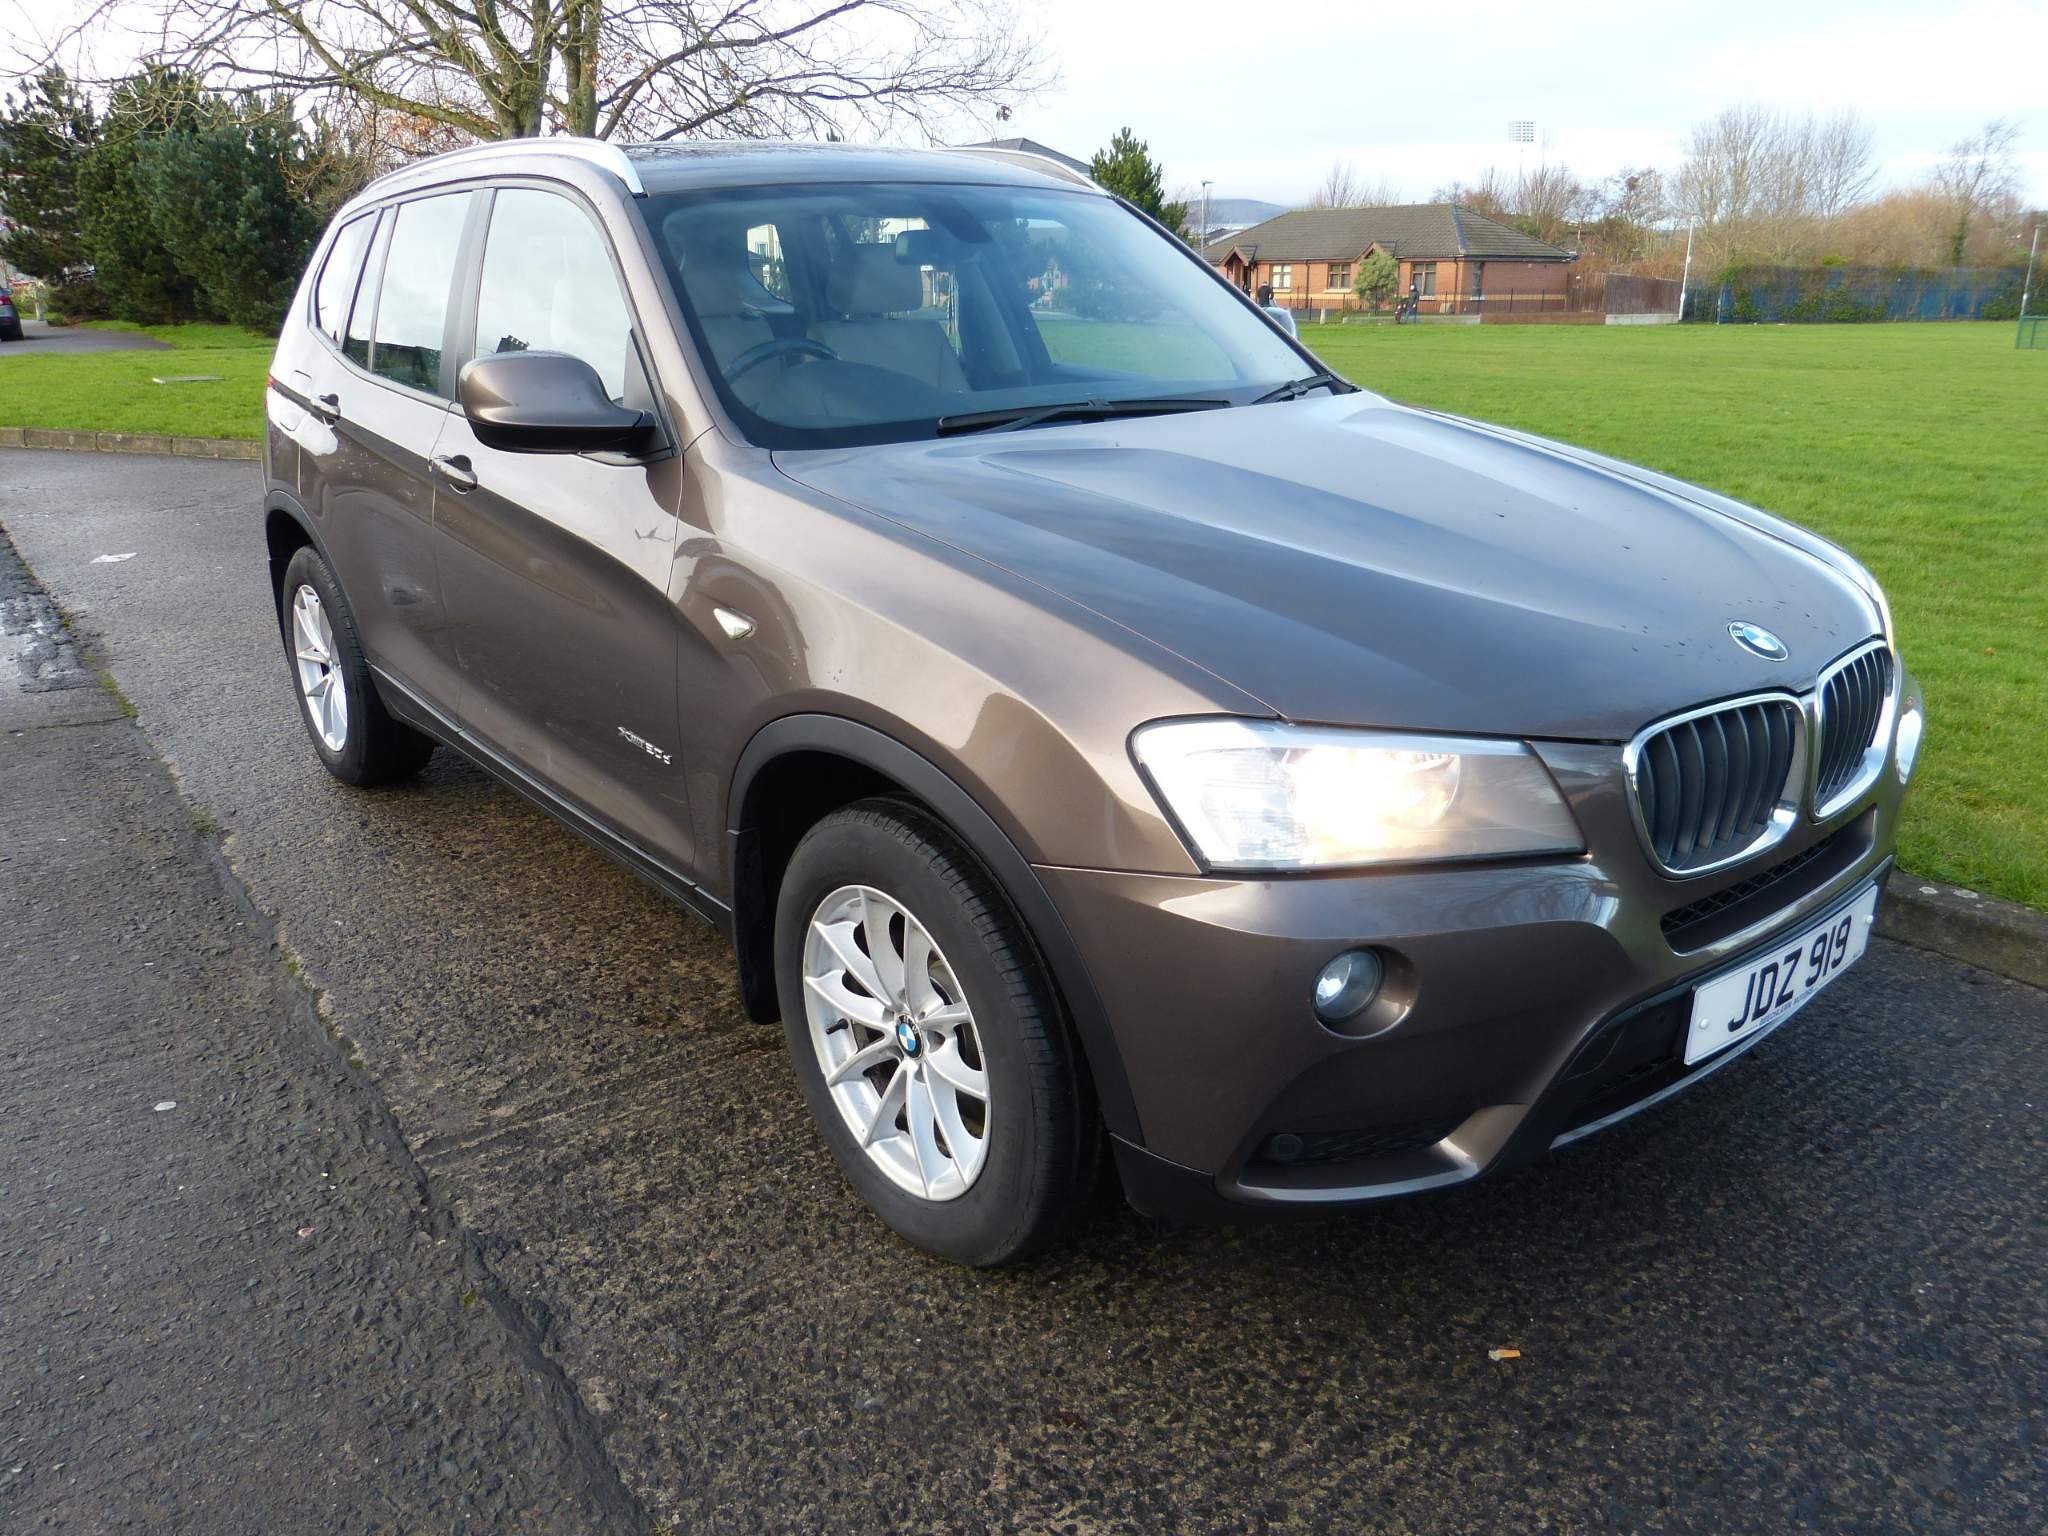 2013 BMW X3 2.0 20d SE Auto xDrive Diesel Automatic  – Beechlawn Motors Belfast